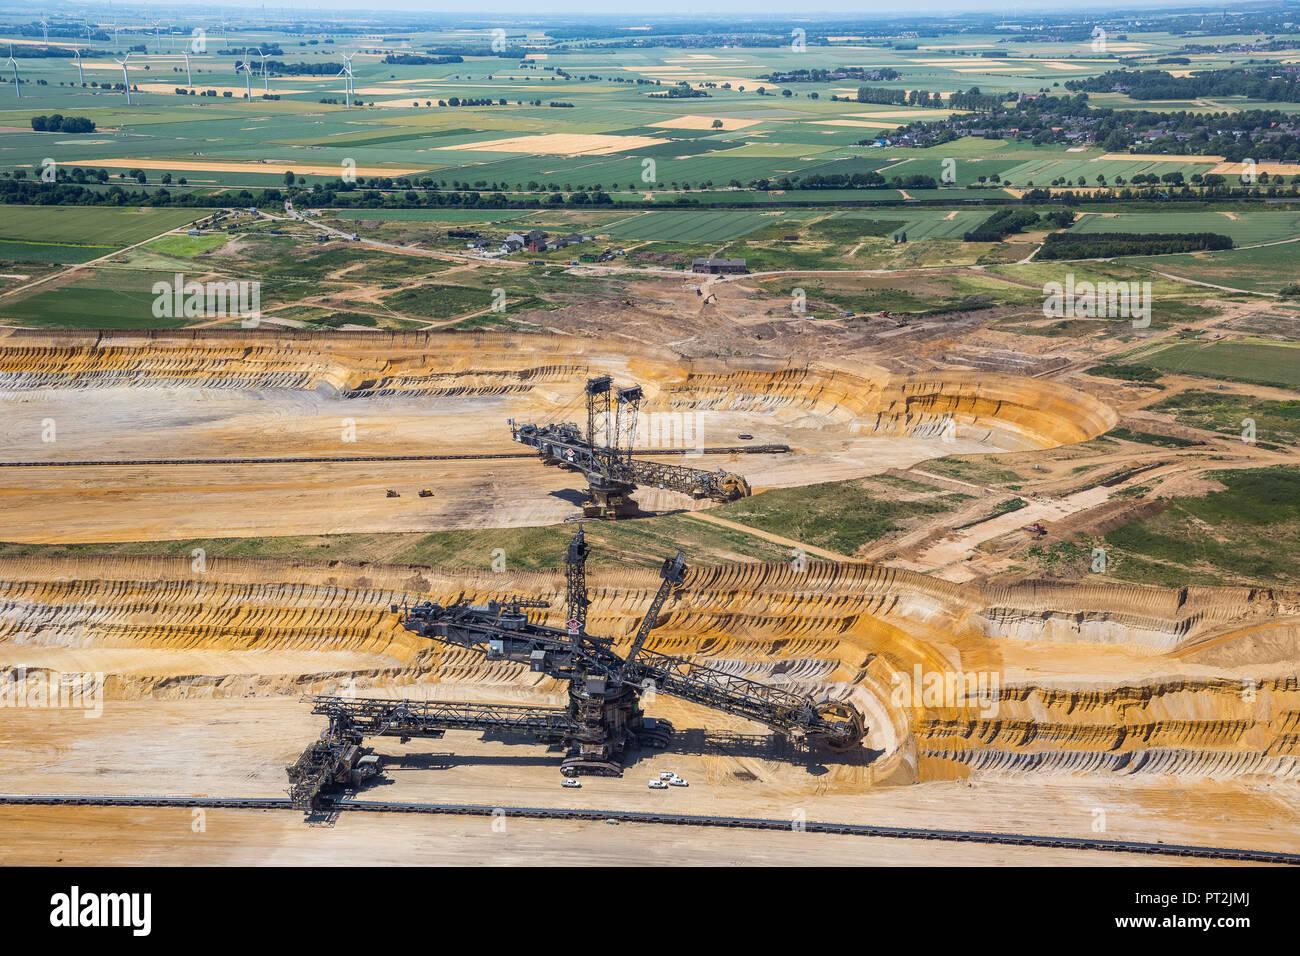 Brown coal excavator, brown coal mine Garzweiler, RWE power, Rhenish brown coal mining area, Borschemich, Jüchen, Lower Rhine, brown coal mining, brown coal area, North Rhine-Westphalia, Germany Stock Photo